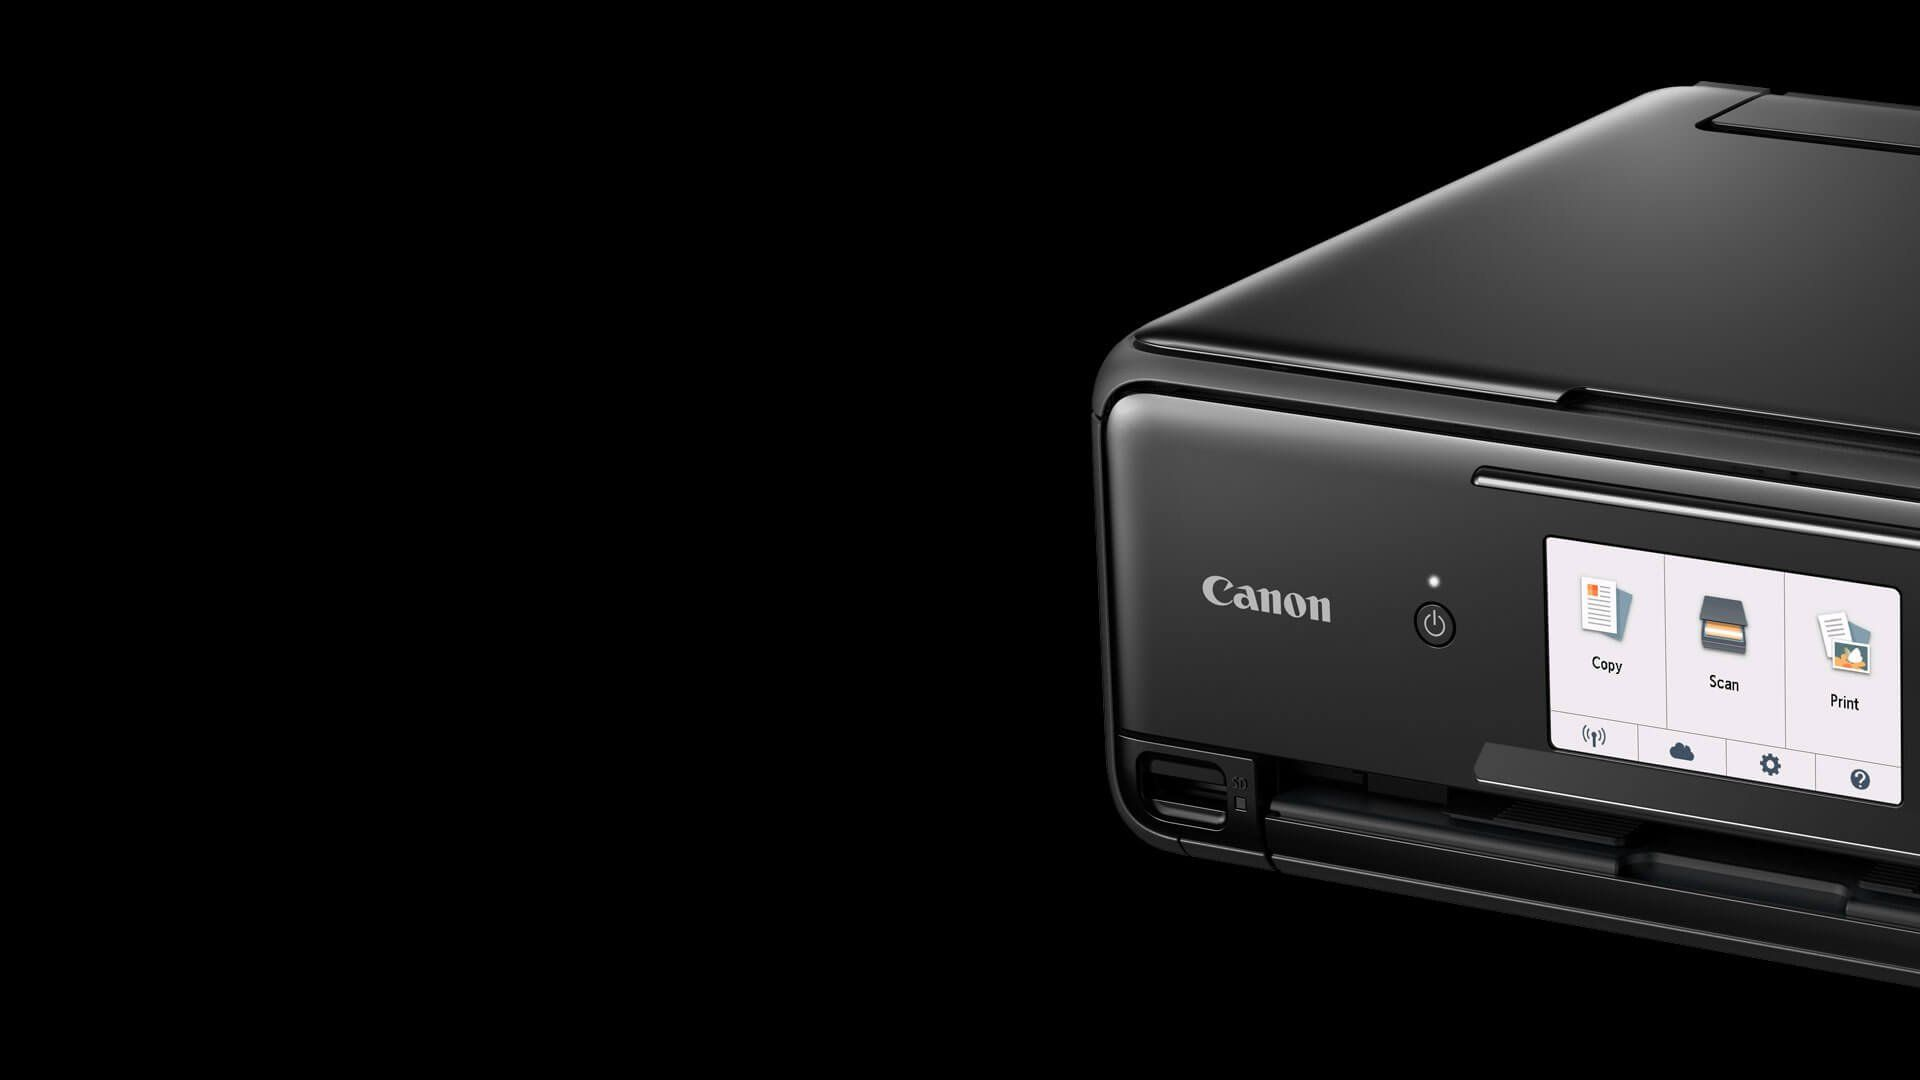 s rie canon pixma ts8150 imprimantes canon france. Black Bedroom Furniture Sets. Home Design Ideas